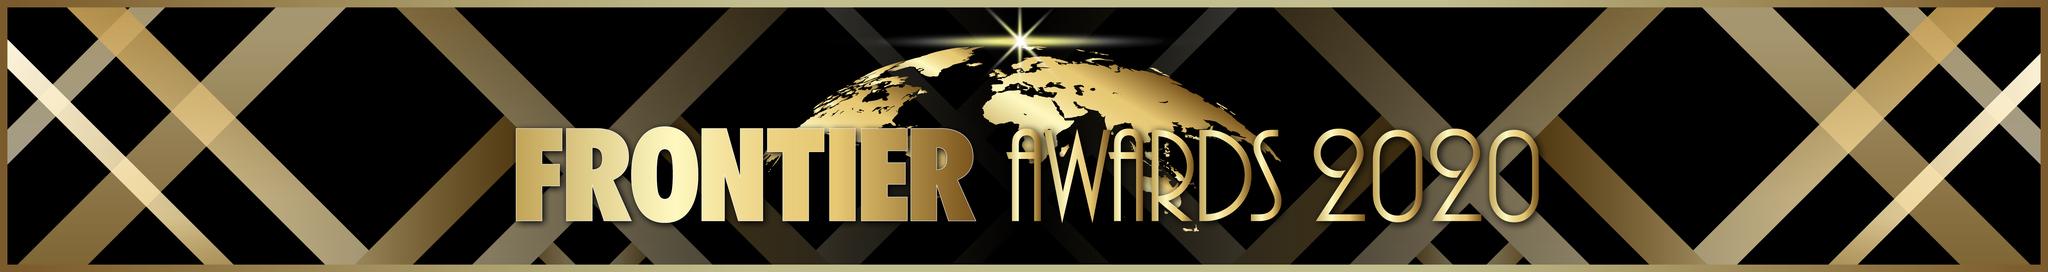 Frontier Awards 2020